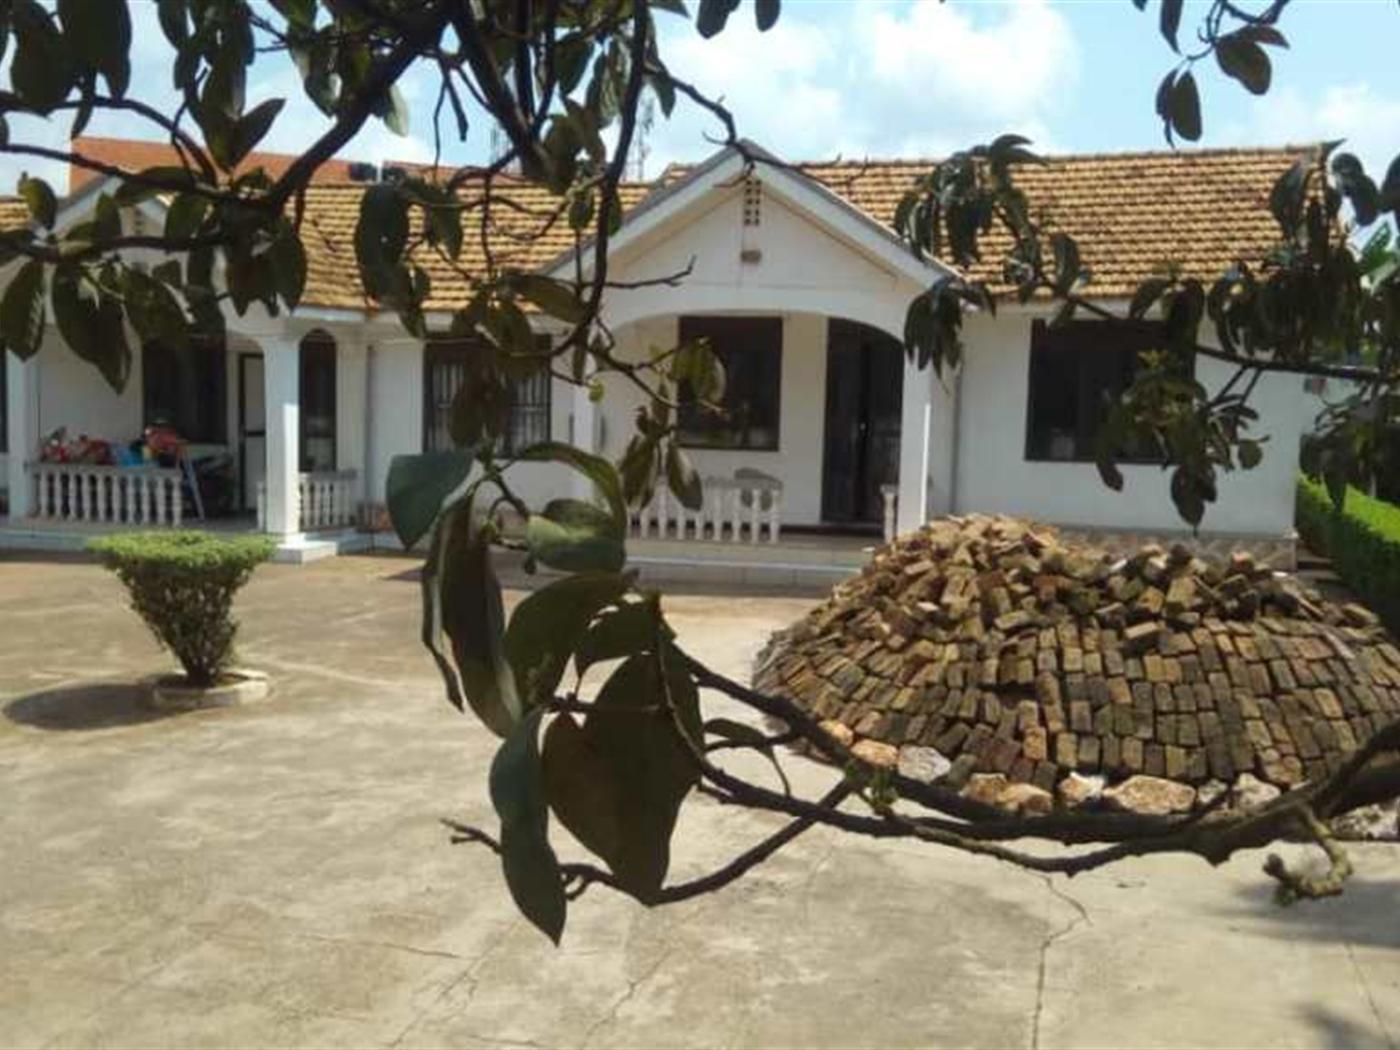 Rental units for sale in Muyenga Kampala